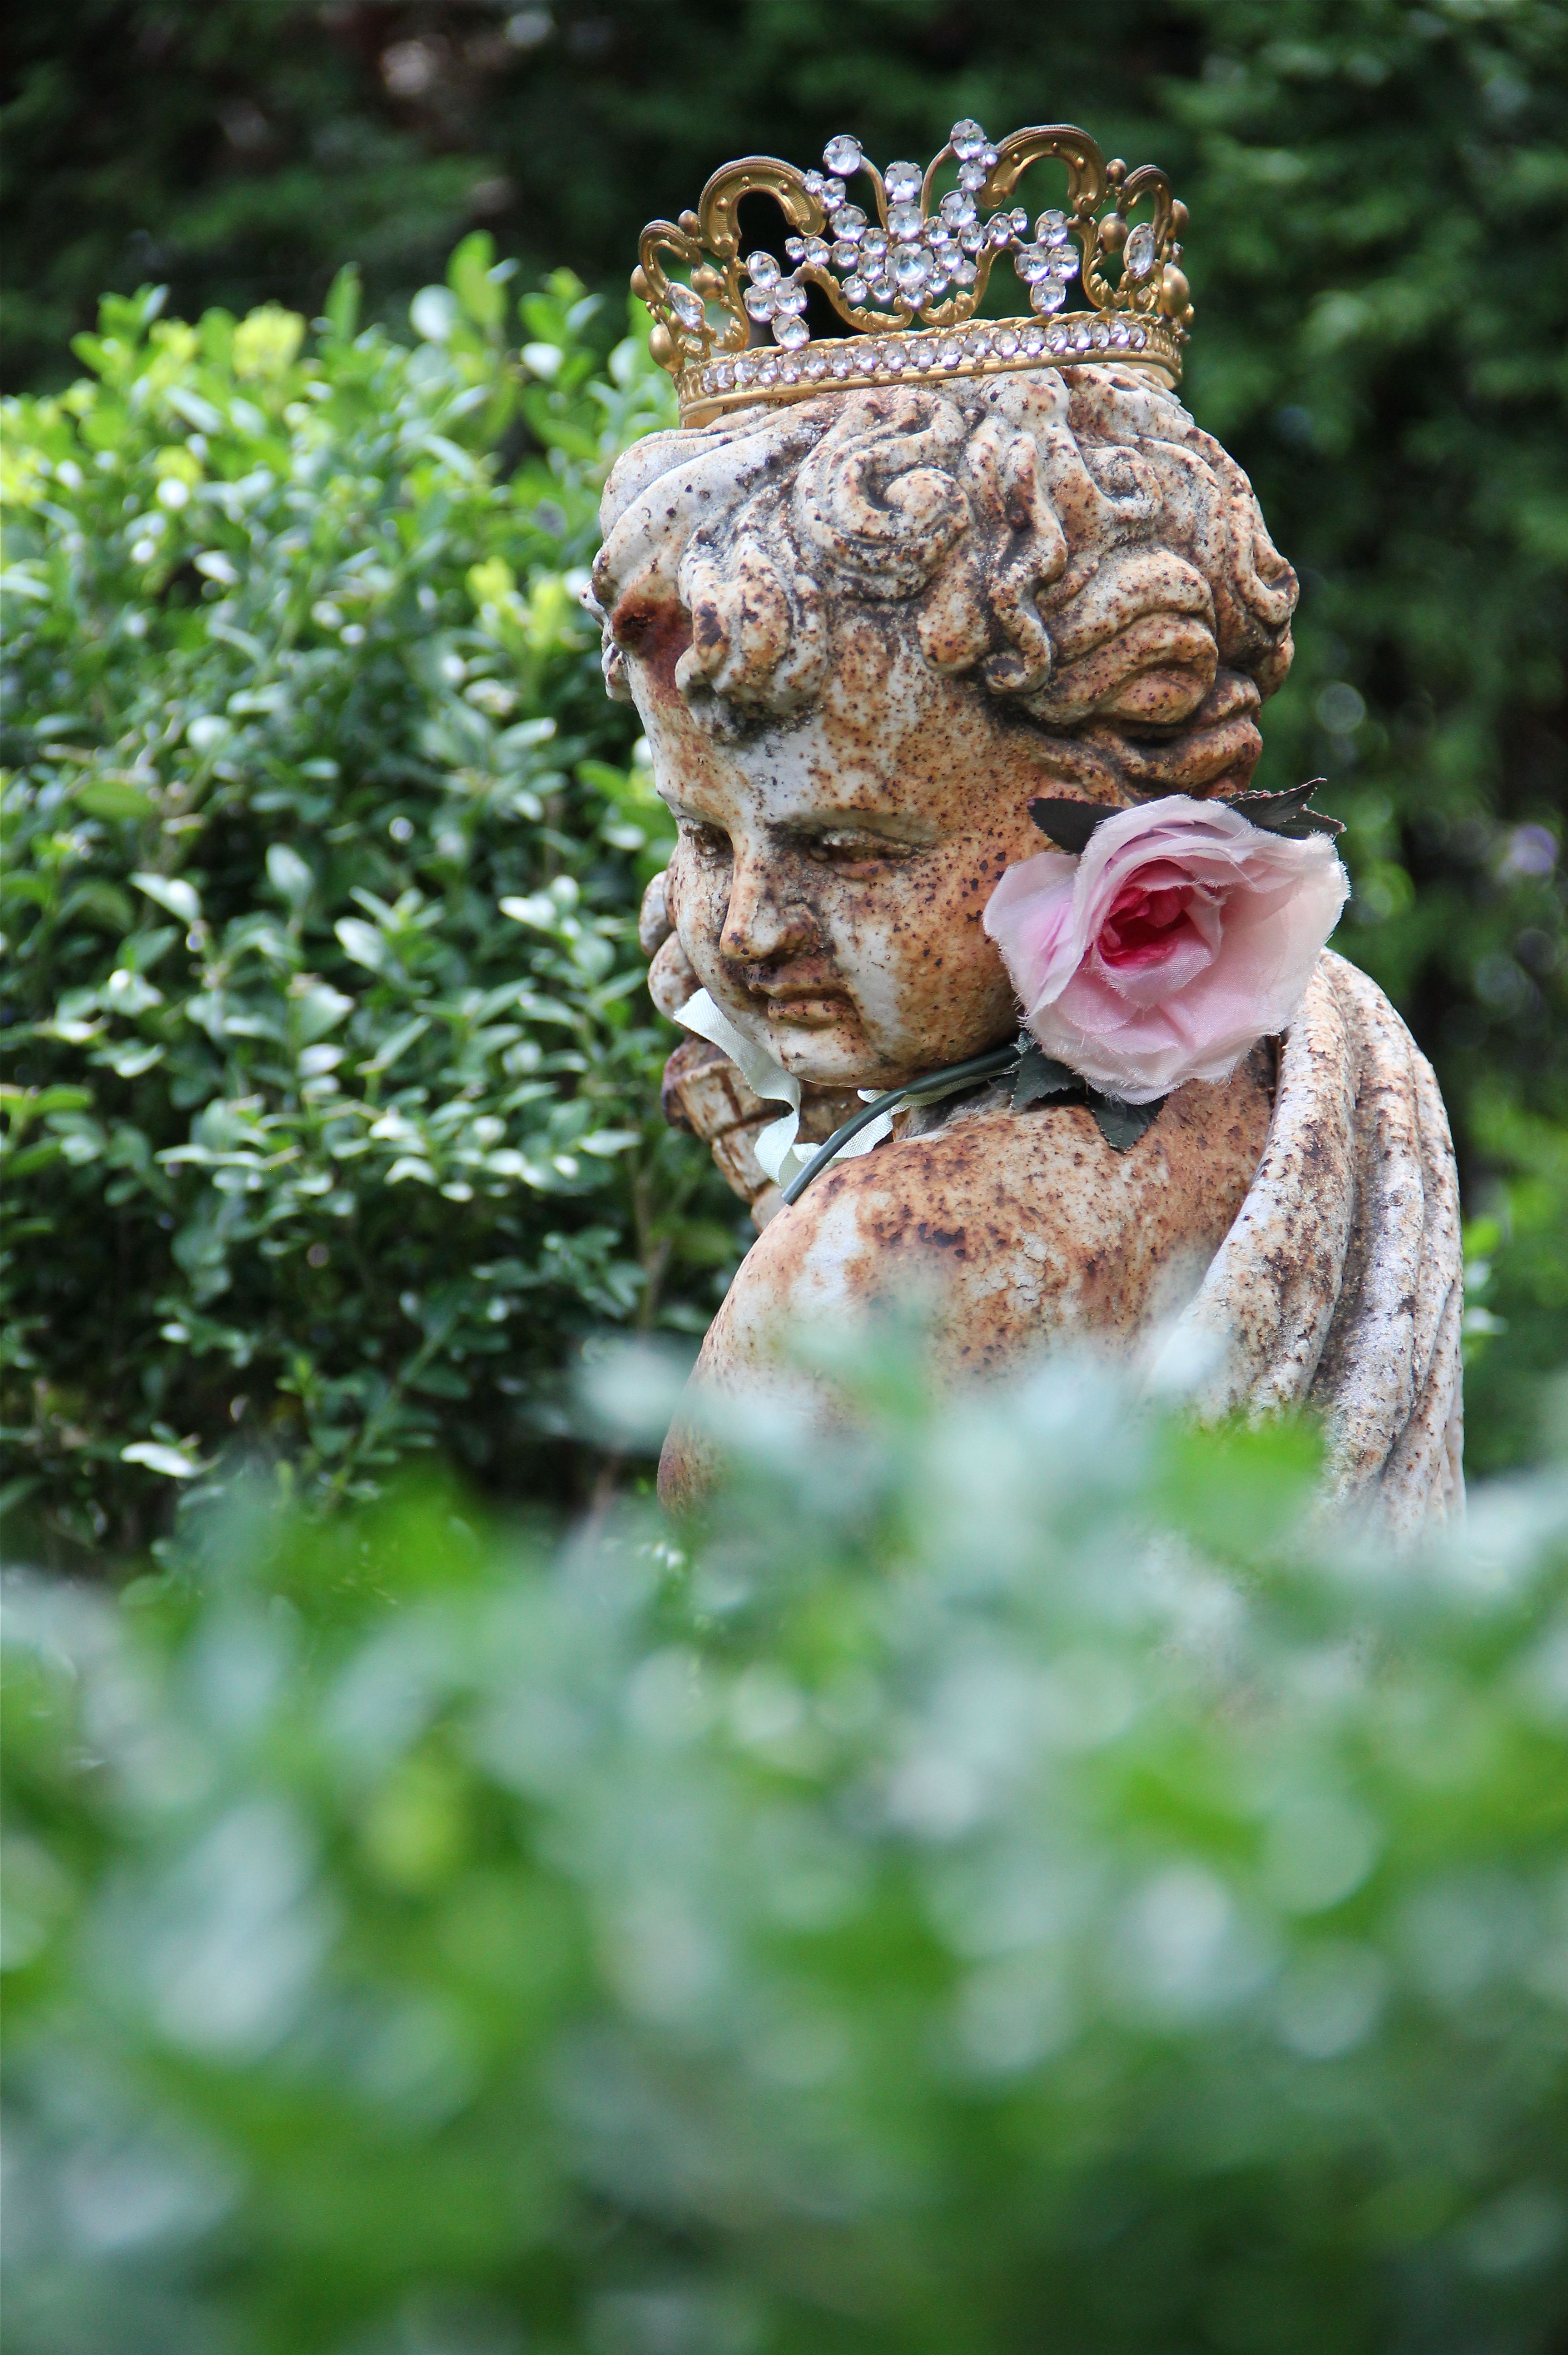 Garden decor statues  α grαdєn σf grαcє  FAR AWAY KINGDOM  Pinterest  Gardens Garden